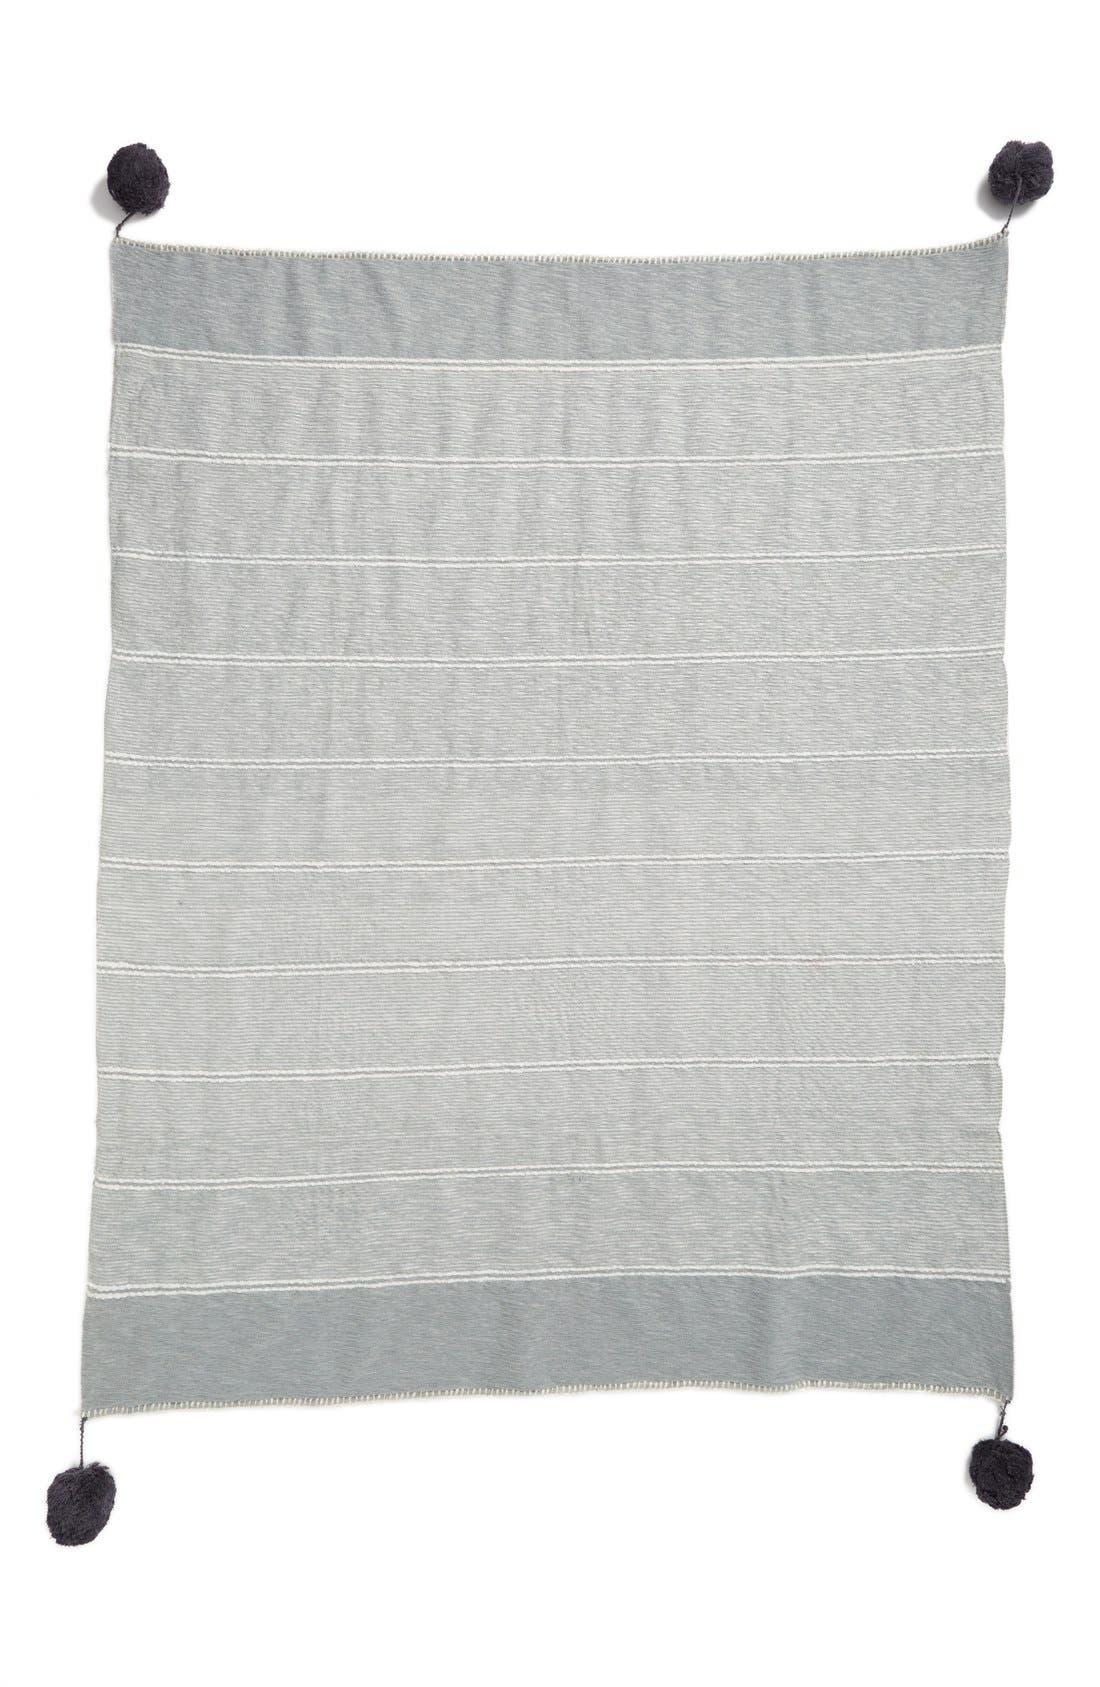 'Feather Stripe' Throw Blanket,                             Alternate thumbnail 3, color,                             020